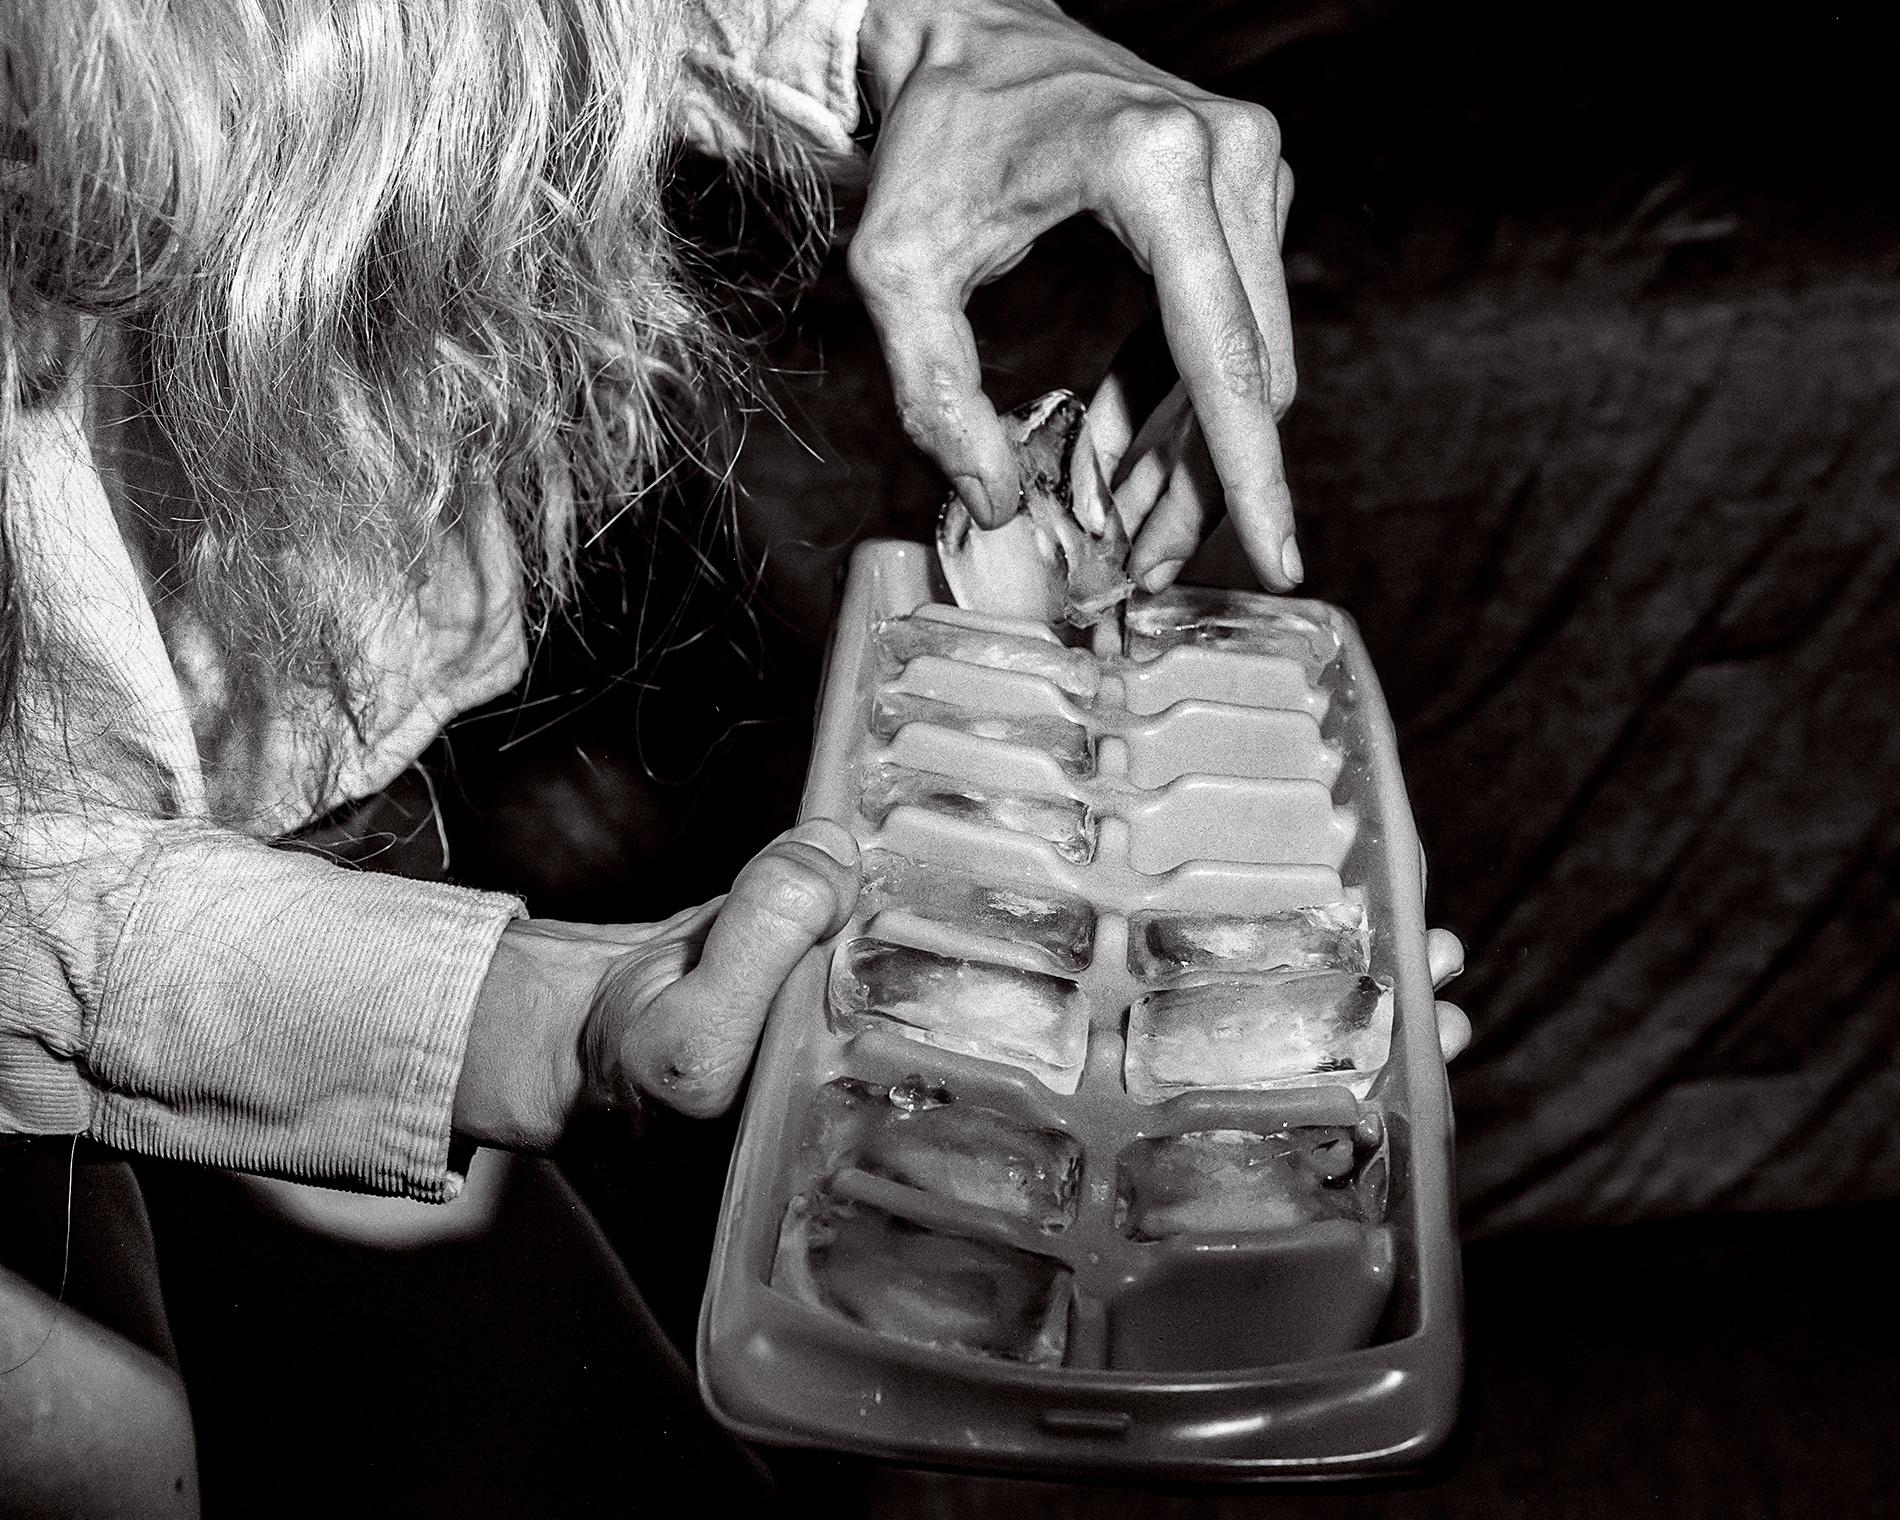 Handling Ice by Riel Sturchio